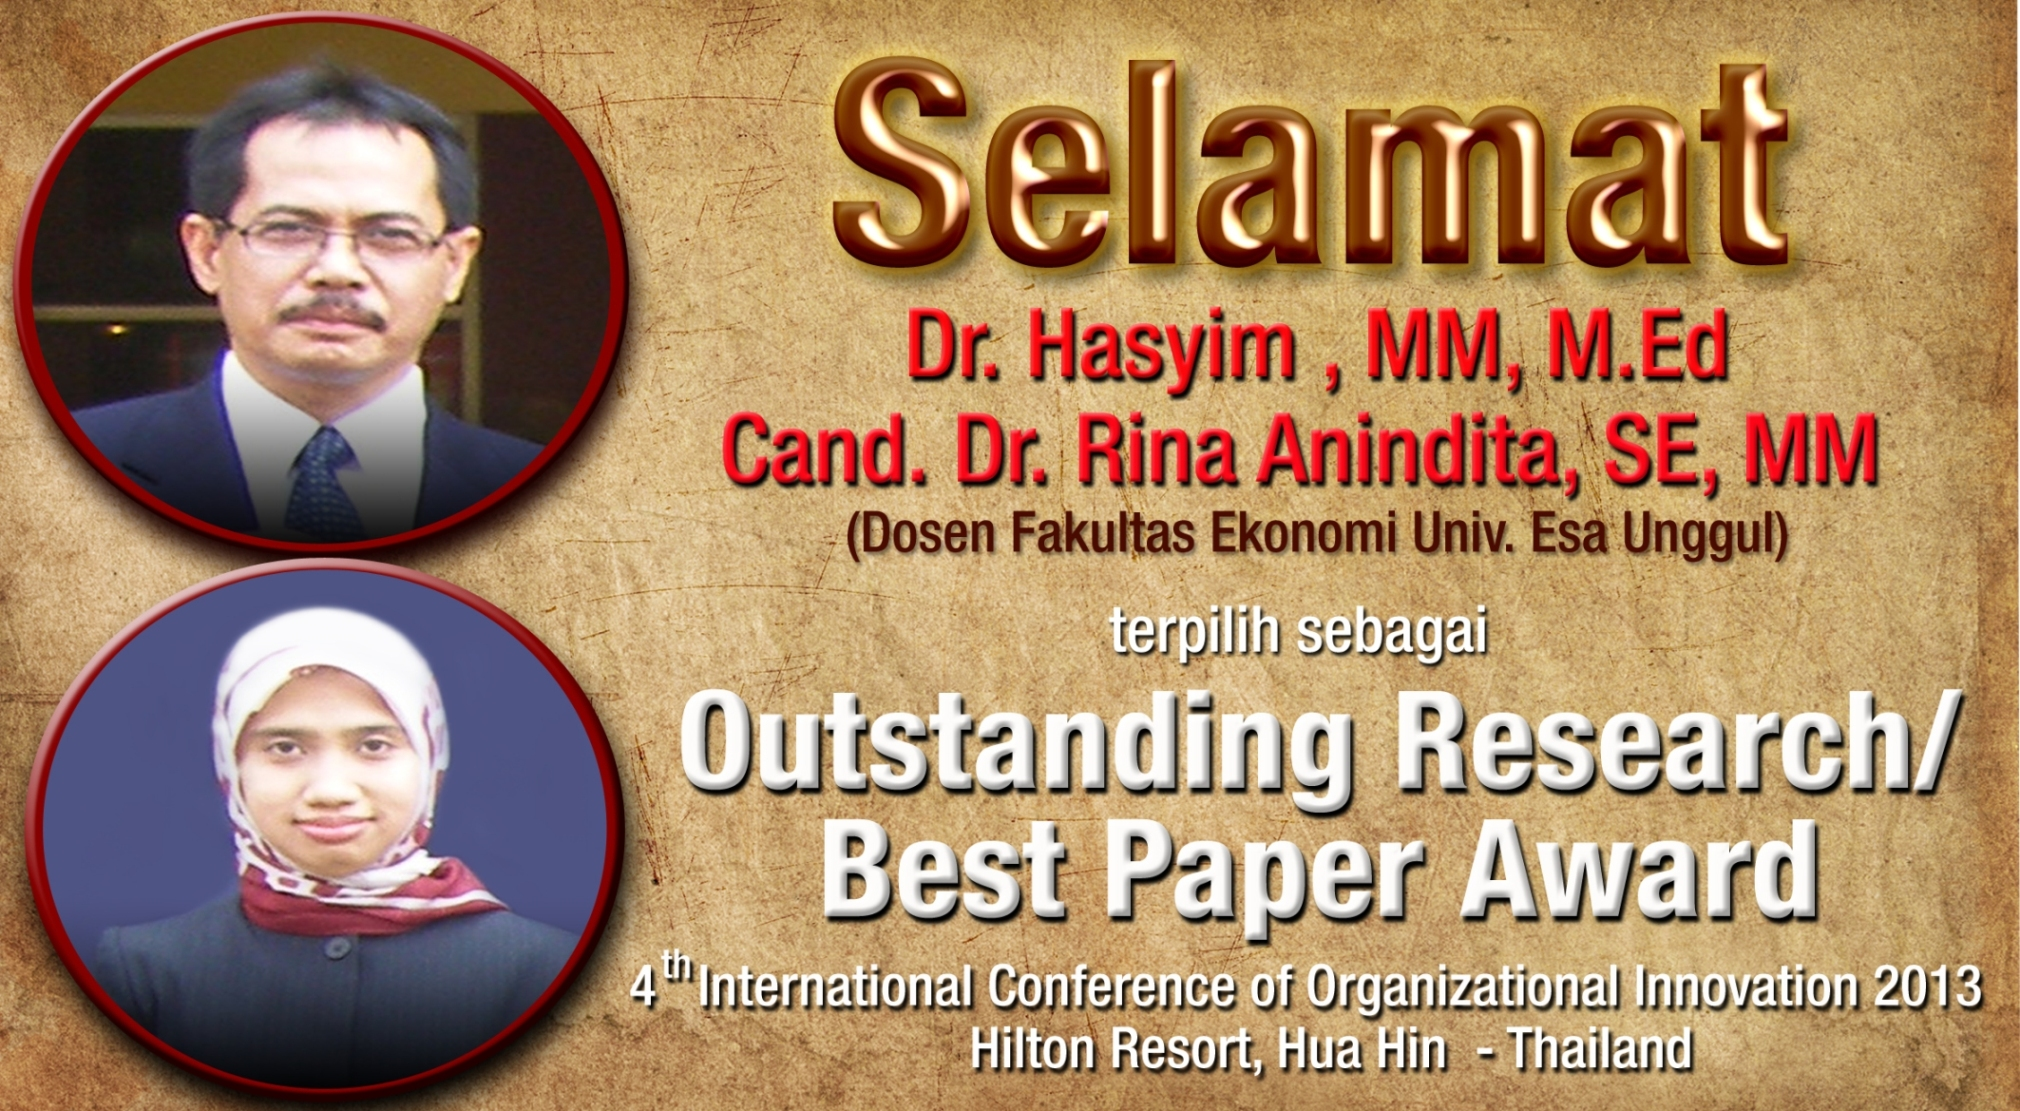 Universitas Esa Unggul mengucapkan Selamat atas terpilihnya Dr. Hasyim, MM, M.Ed dan Cand. Dr. Rina Anindita, SE, MM sebagai Outstanding Research/Best Paper Award pada 4 th International Conference of Organizational Innovation 2013, Thailand